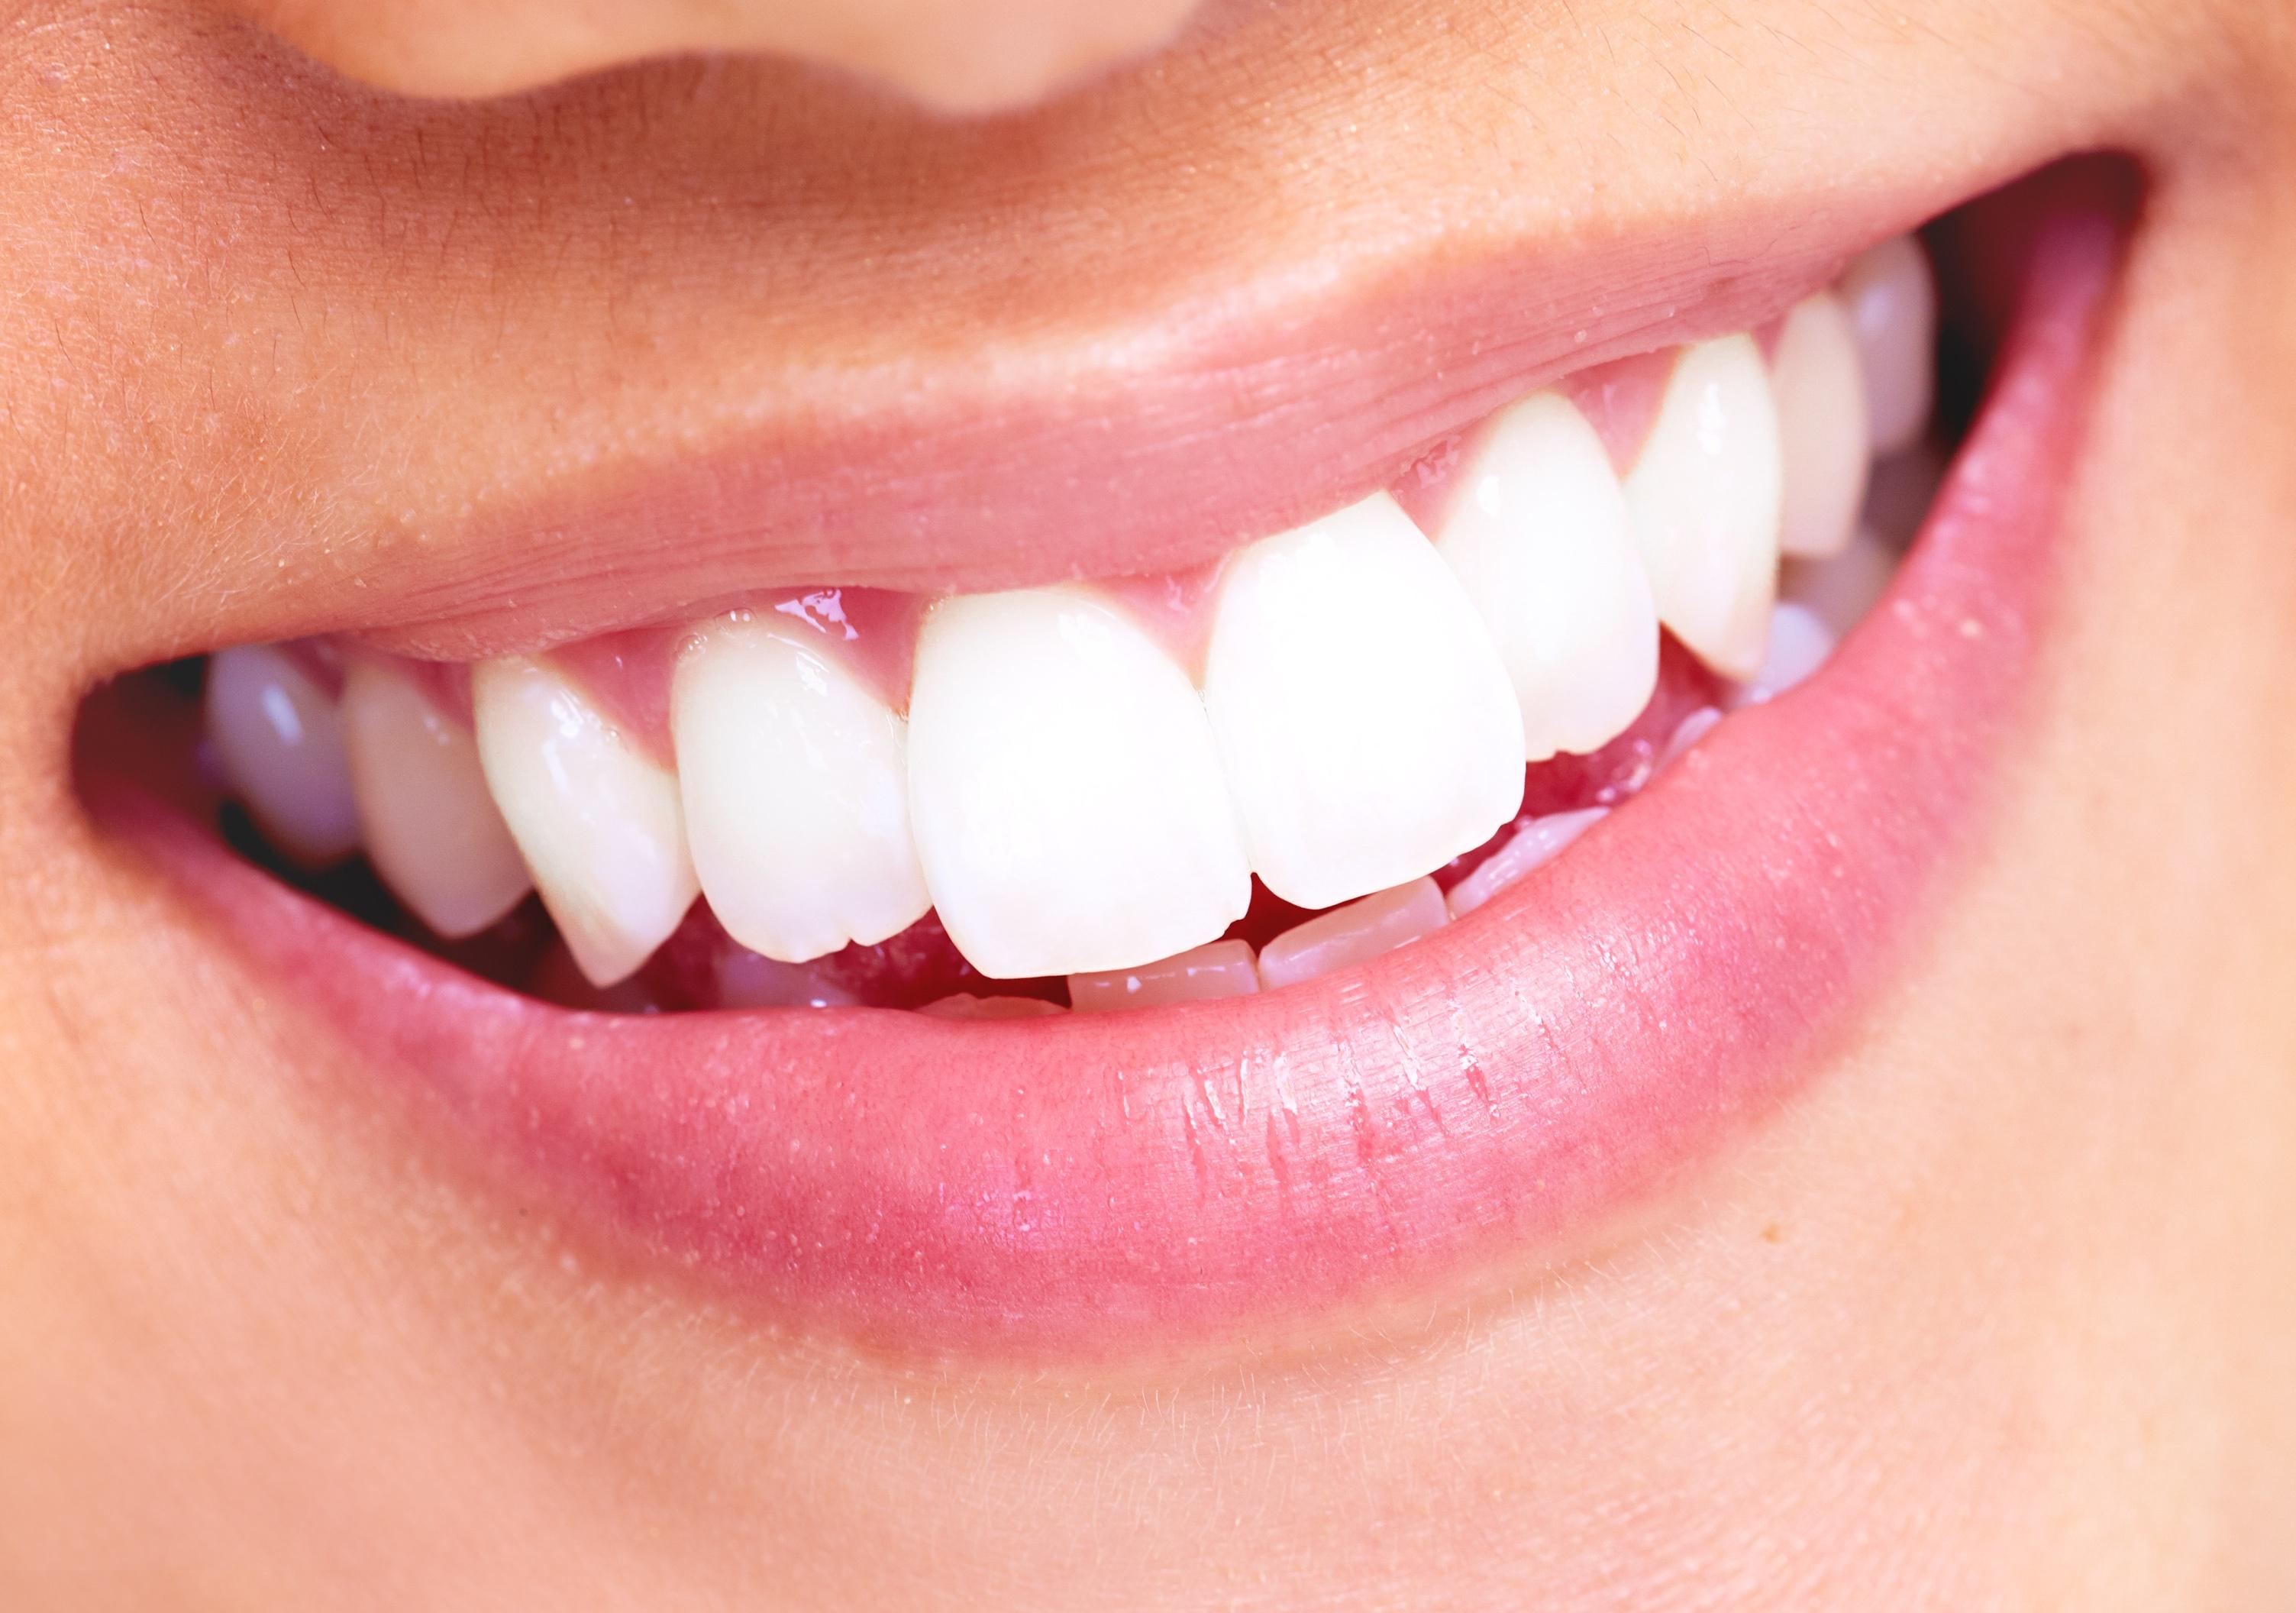 Garden City teeth whitening